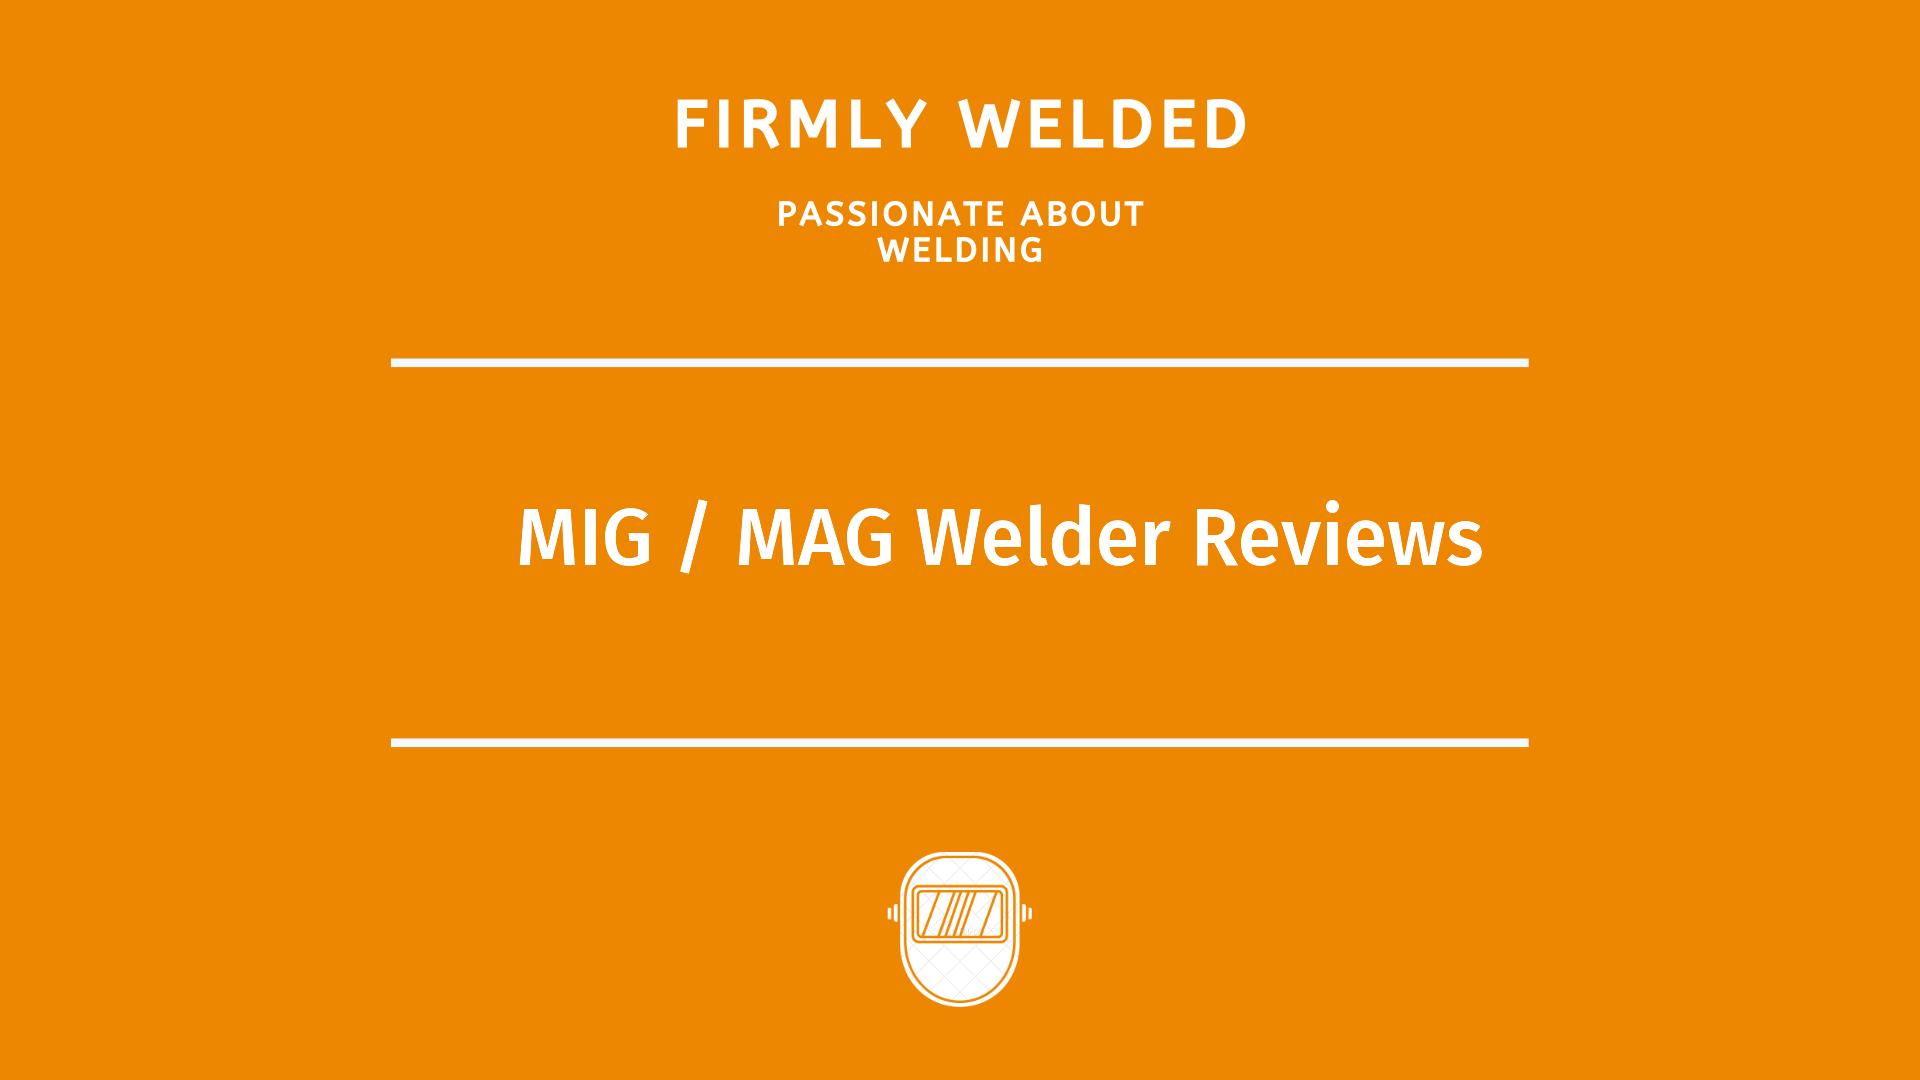 MIG / MAG Welder Reviews